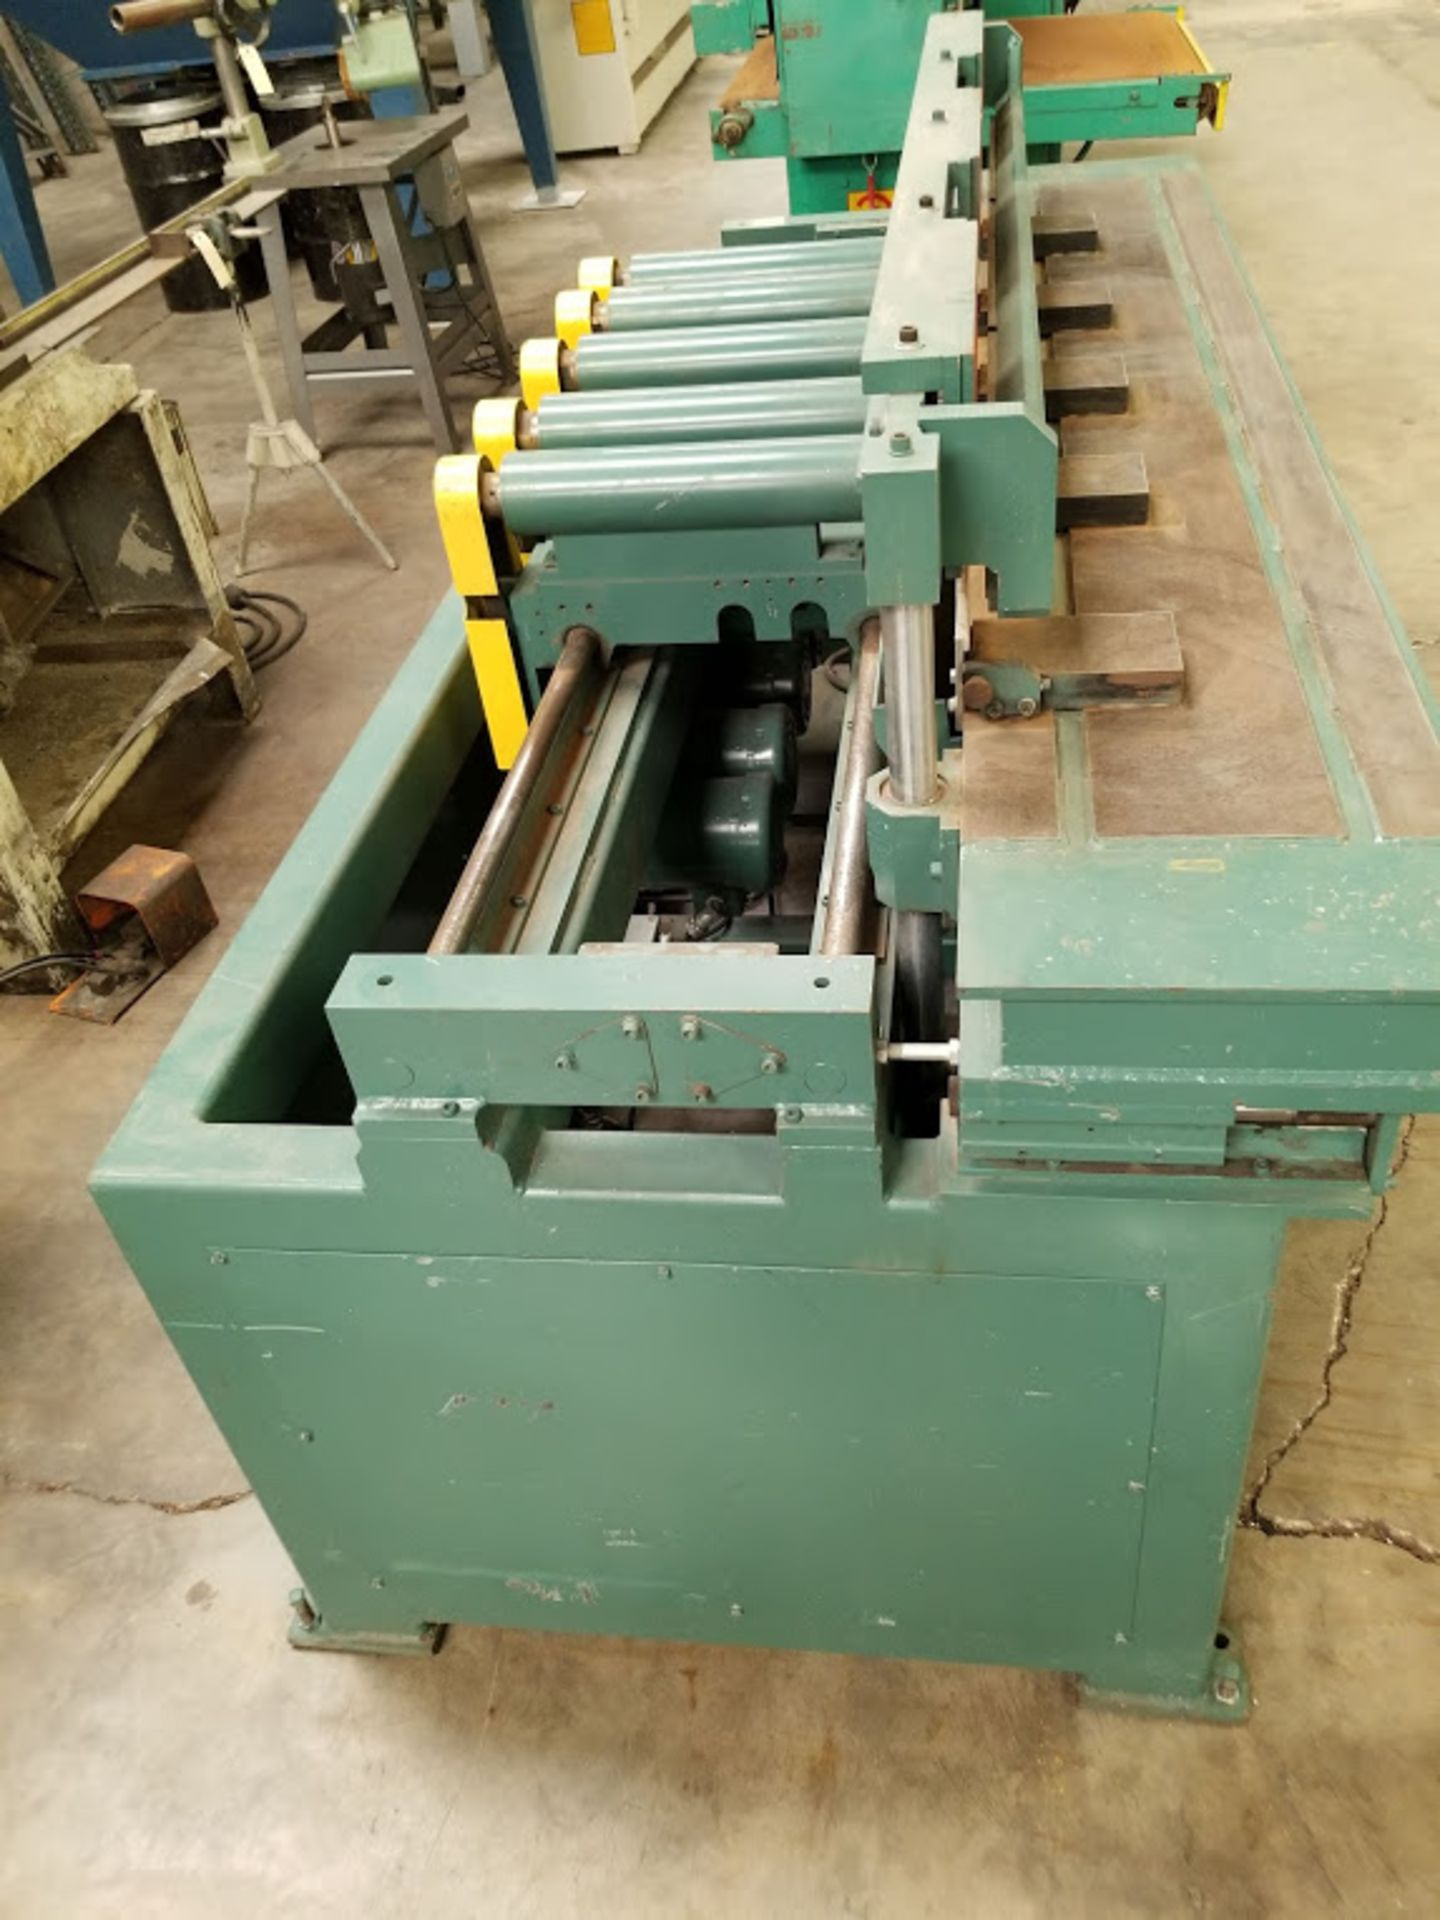 Dodds 5-Spindle Boring Machine, Model: B-802 Baldor 1.5HP 208-230/460 Volts (5 Motors) - Image 4 of 6